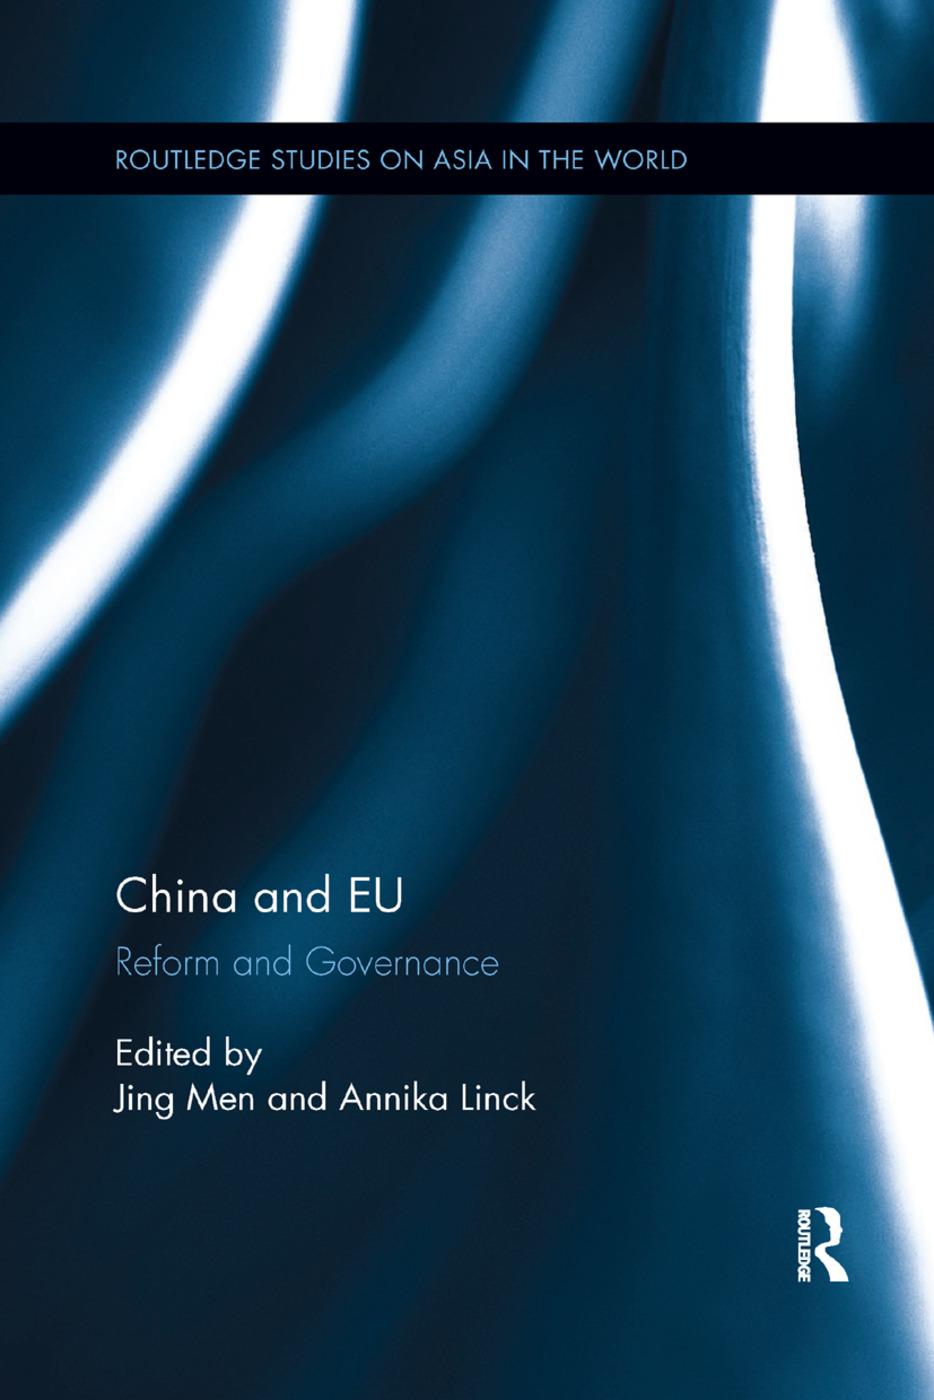 China and EU: Reform and Governance book cover